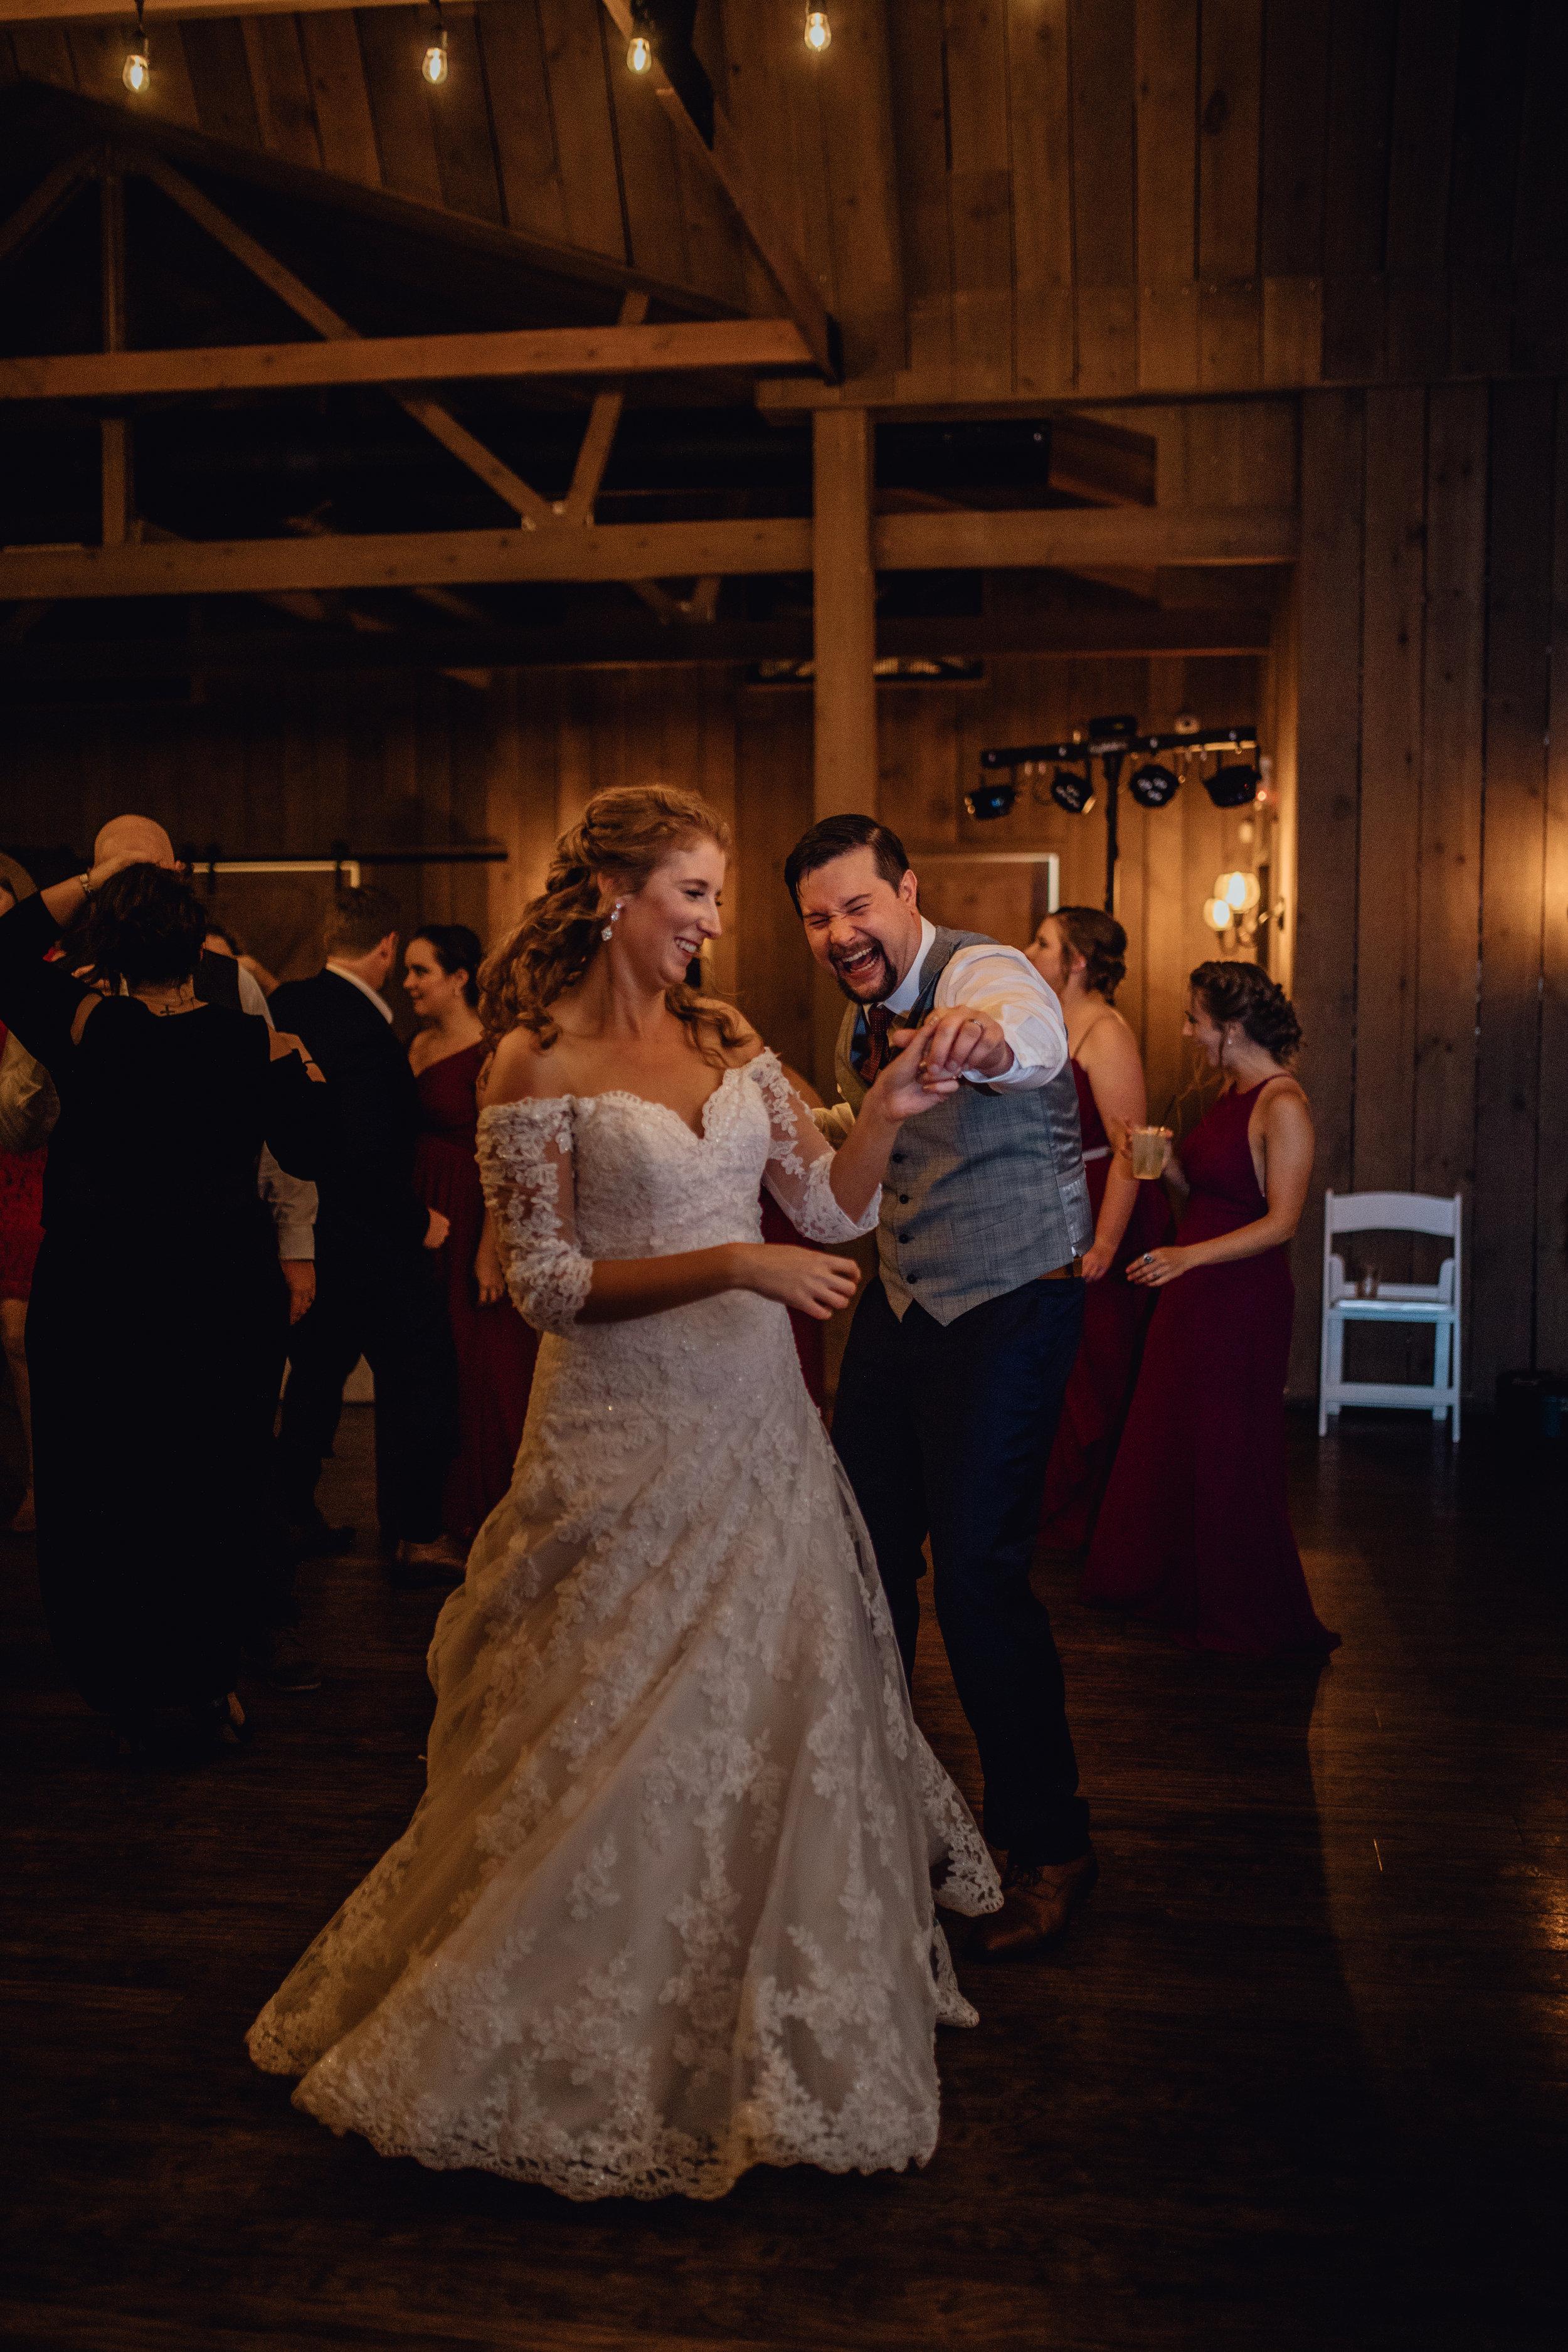 bride-and-groom-dancing-at-rustic-manor-1848.jpg